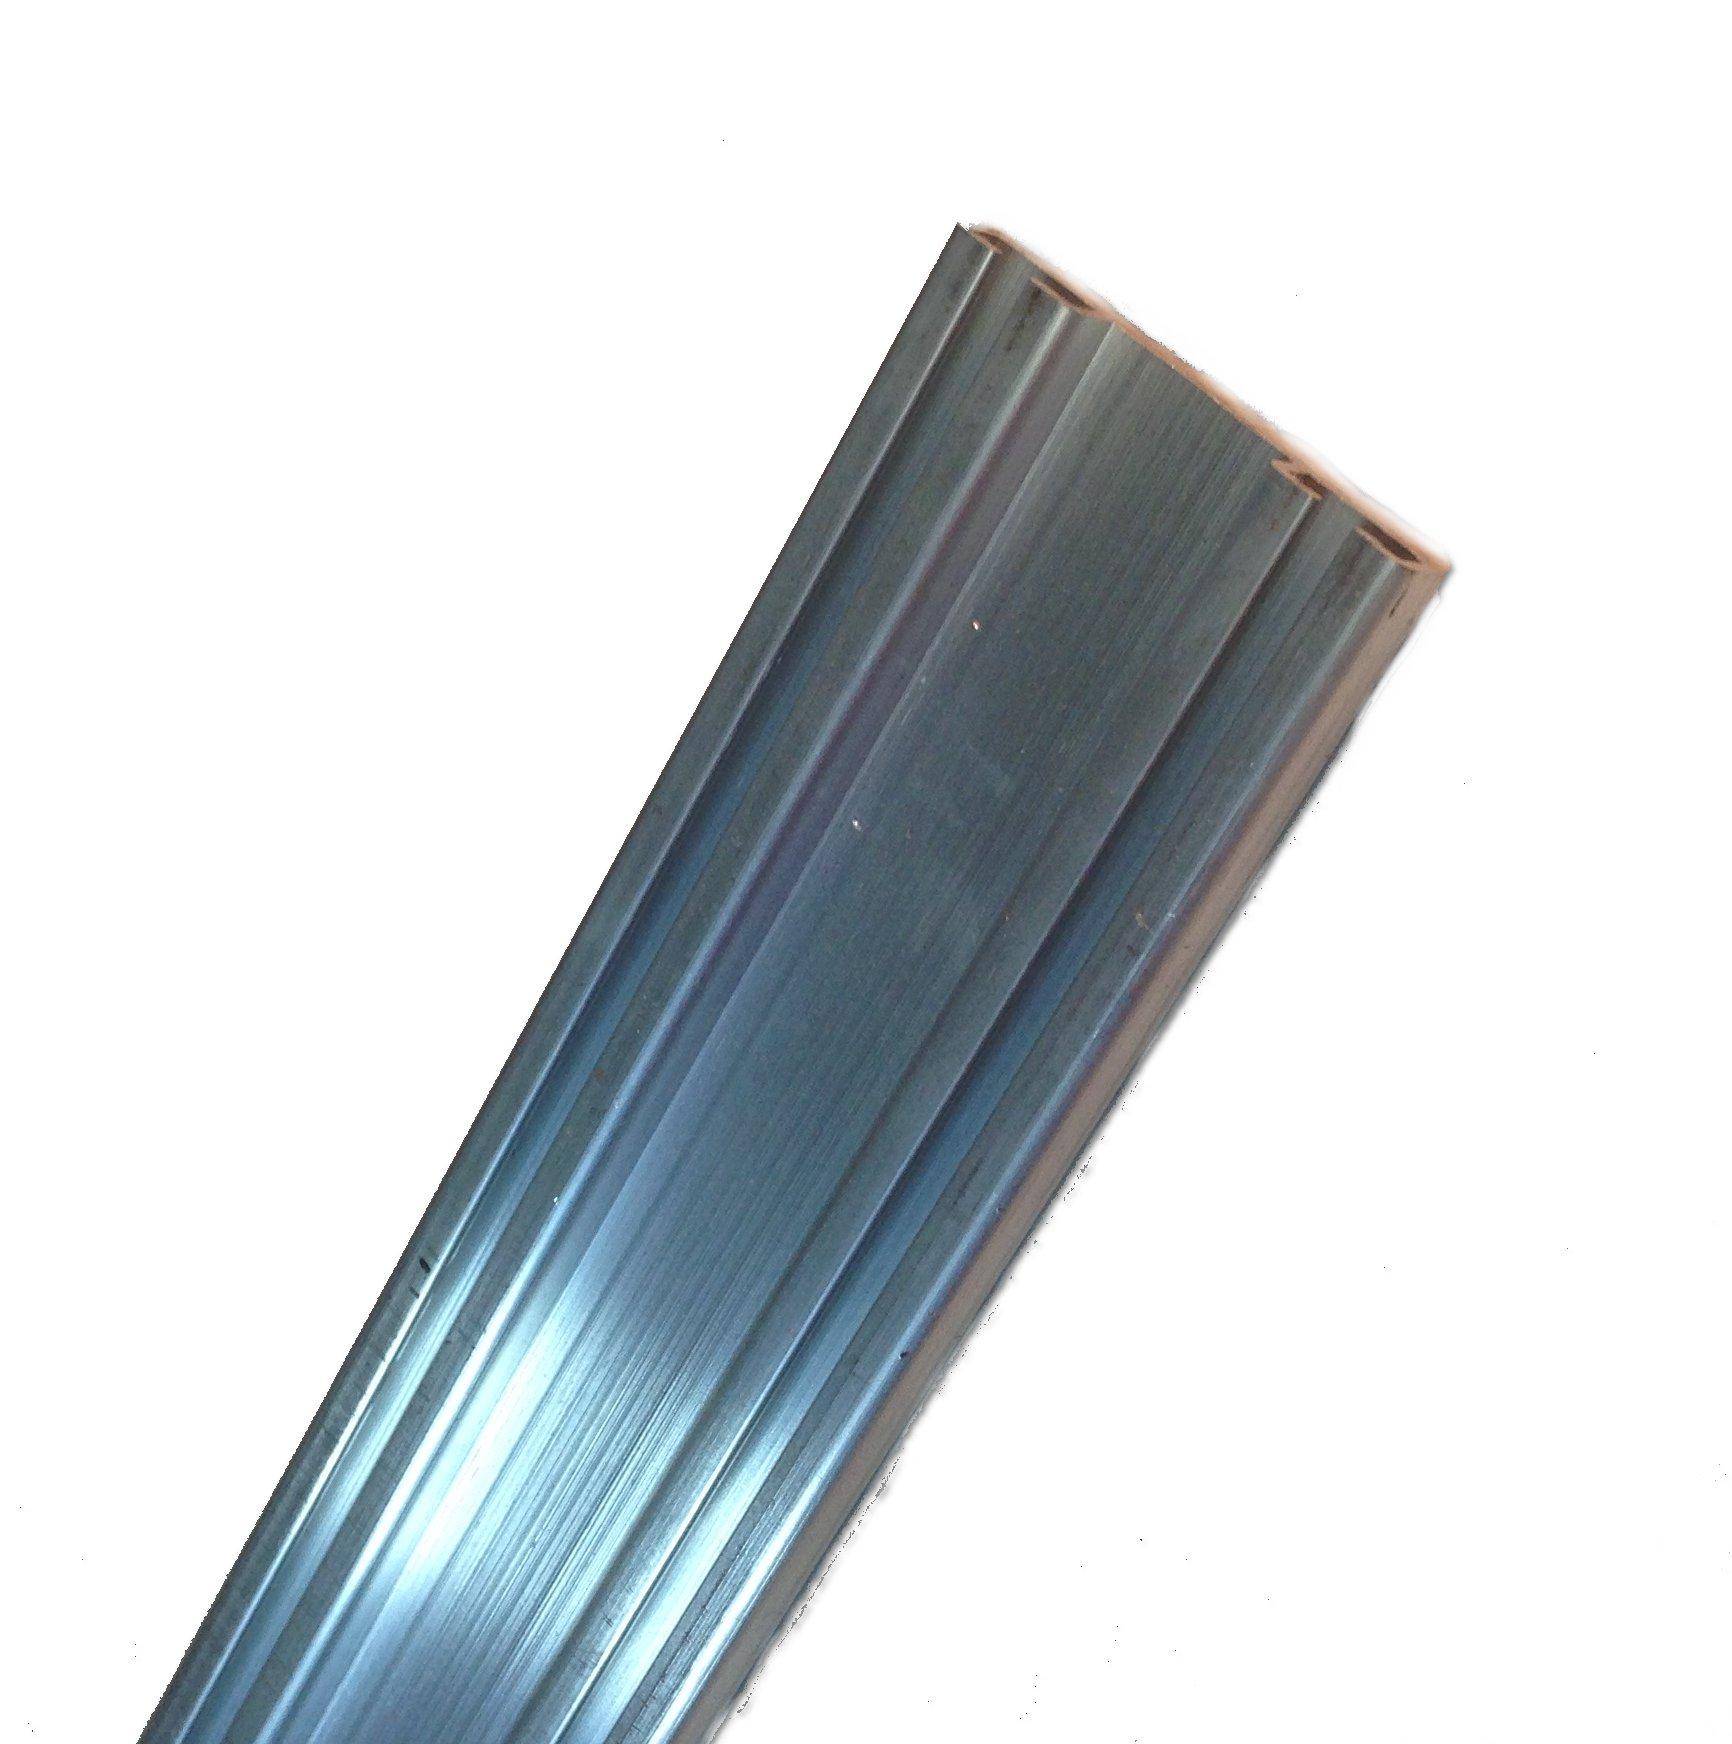 aluminumretainer.jpg